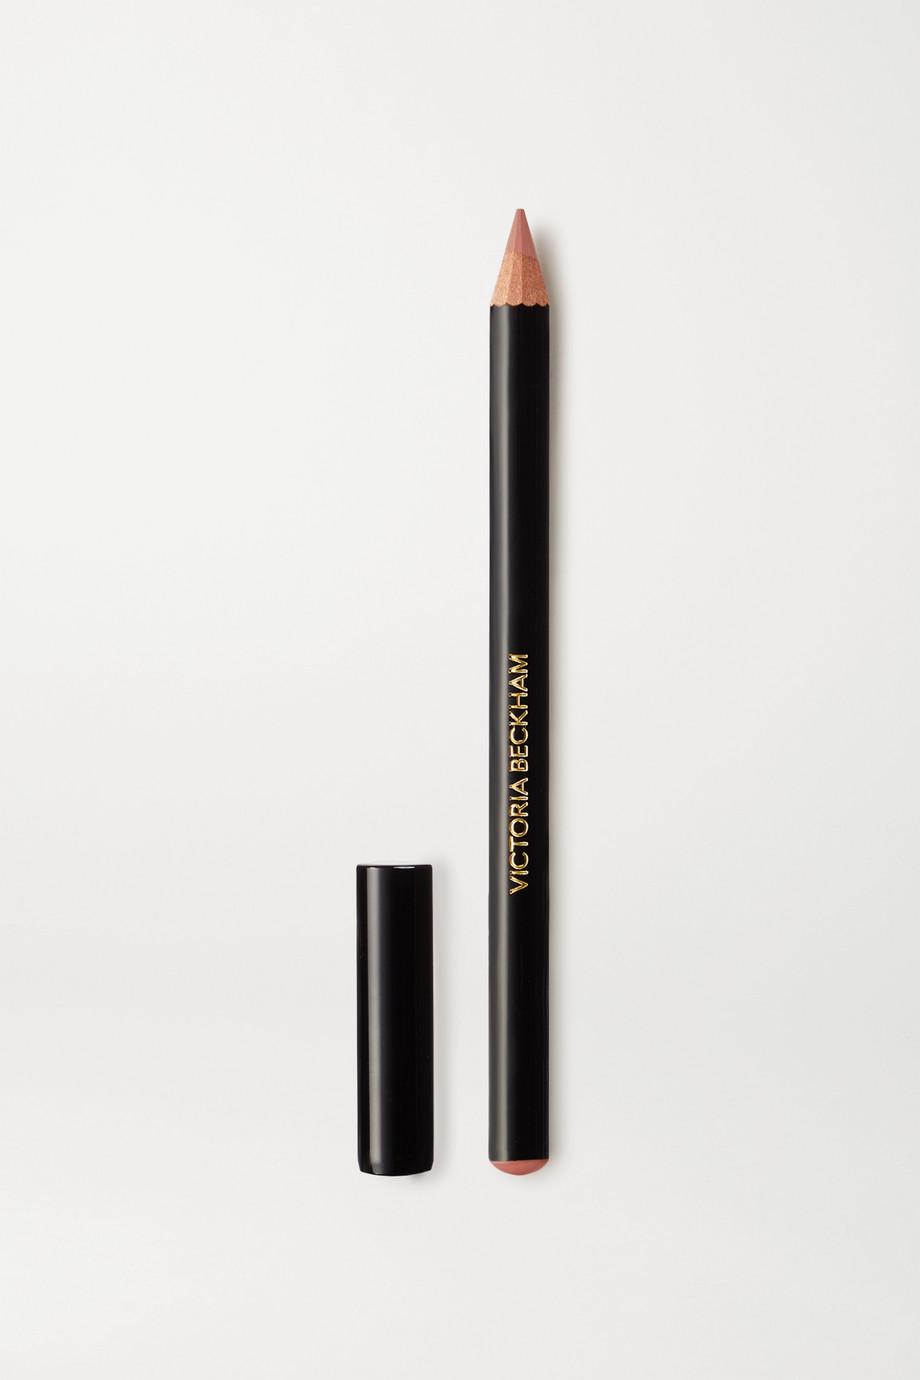 Victoria Beckham Beauty Lip Definer - 01